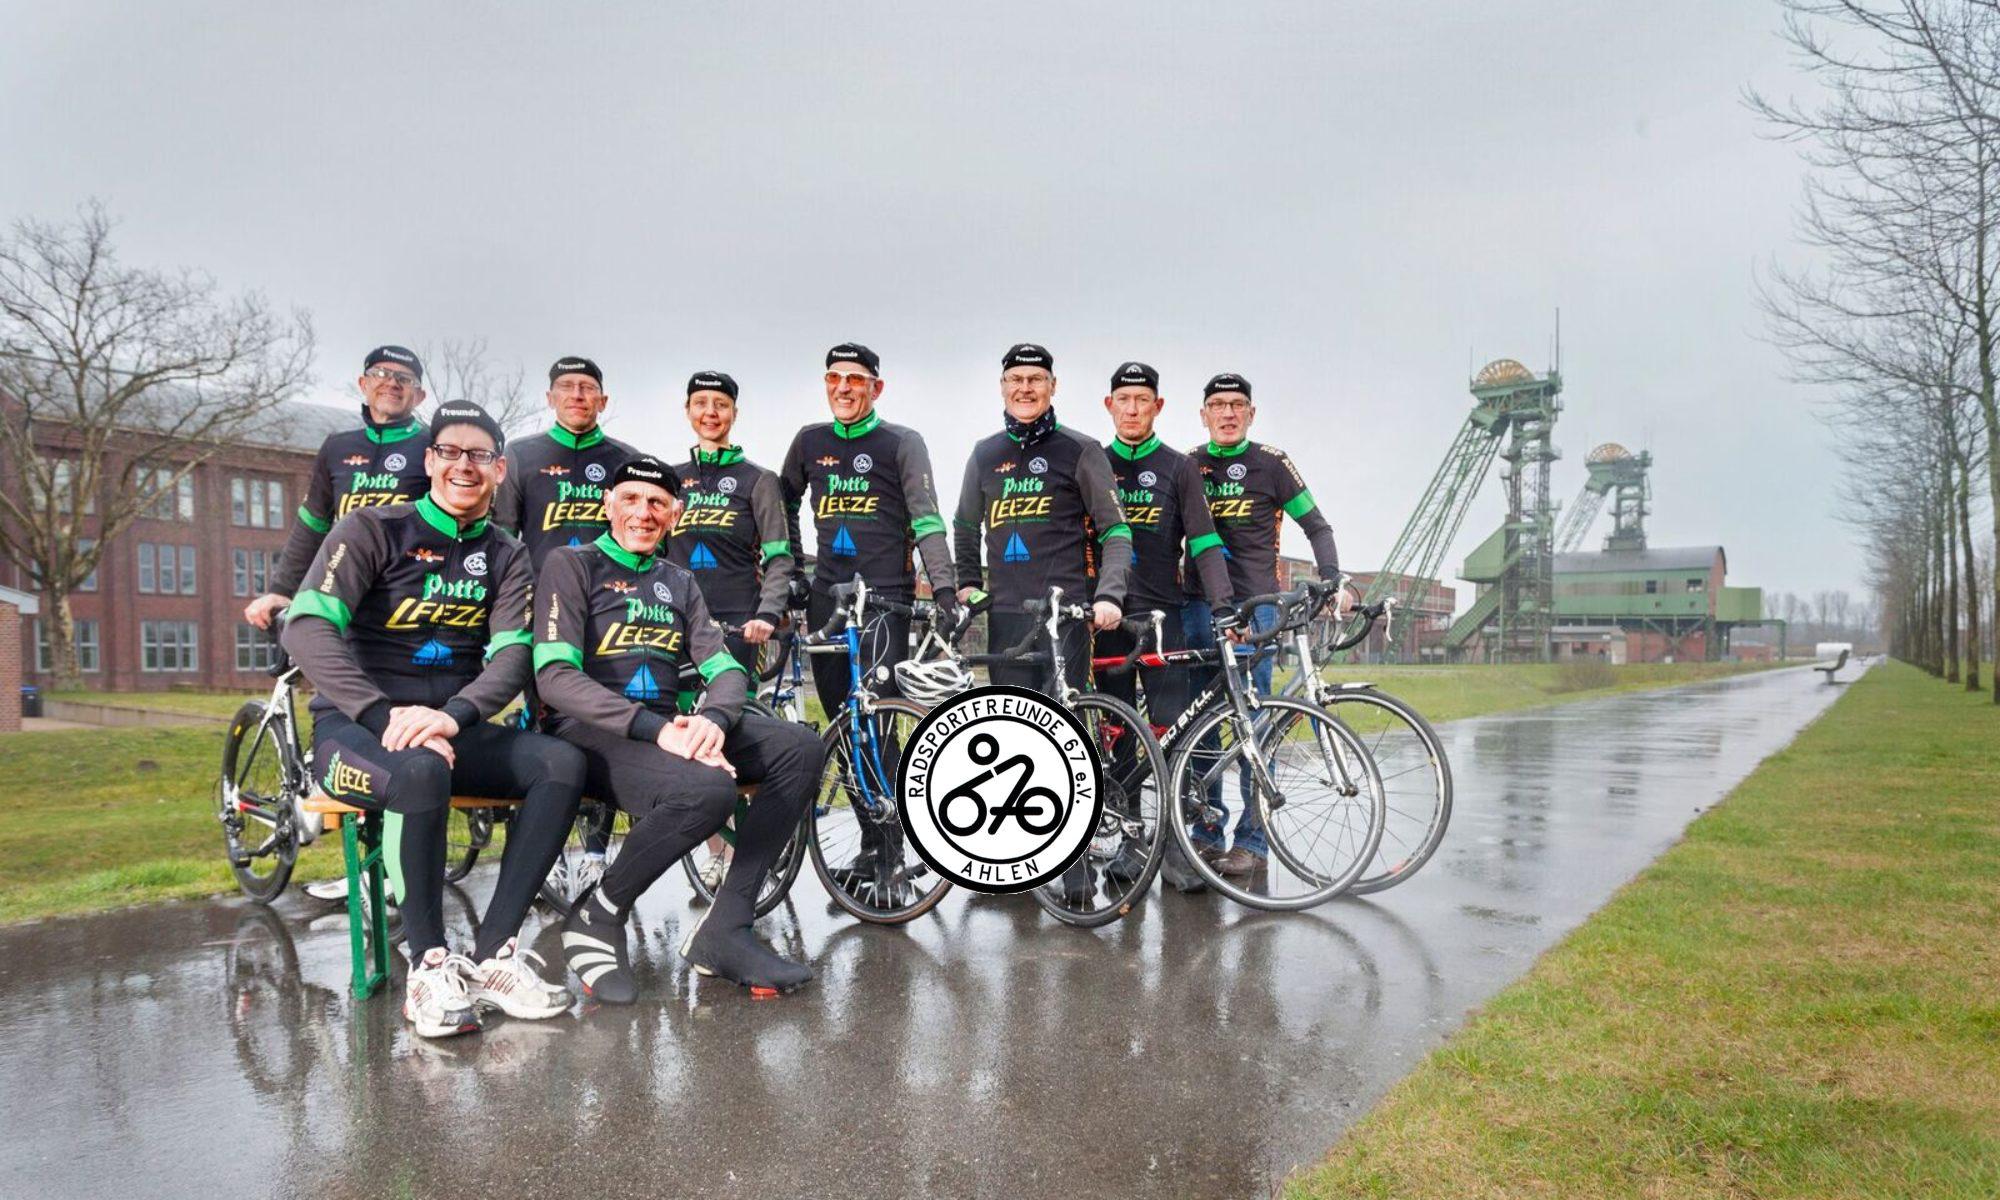 Radsportfreunde 67 Ahlen e.V.